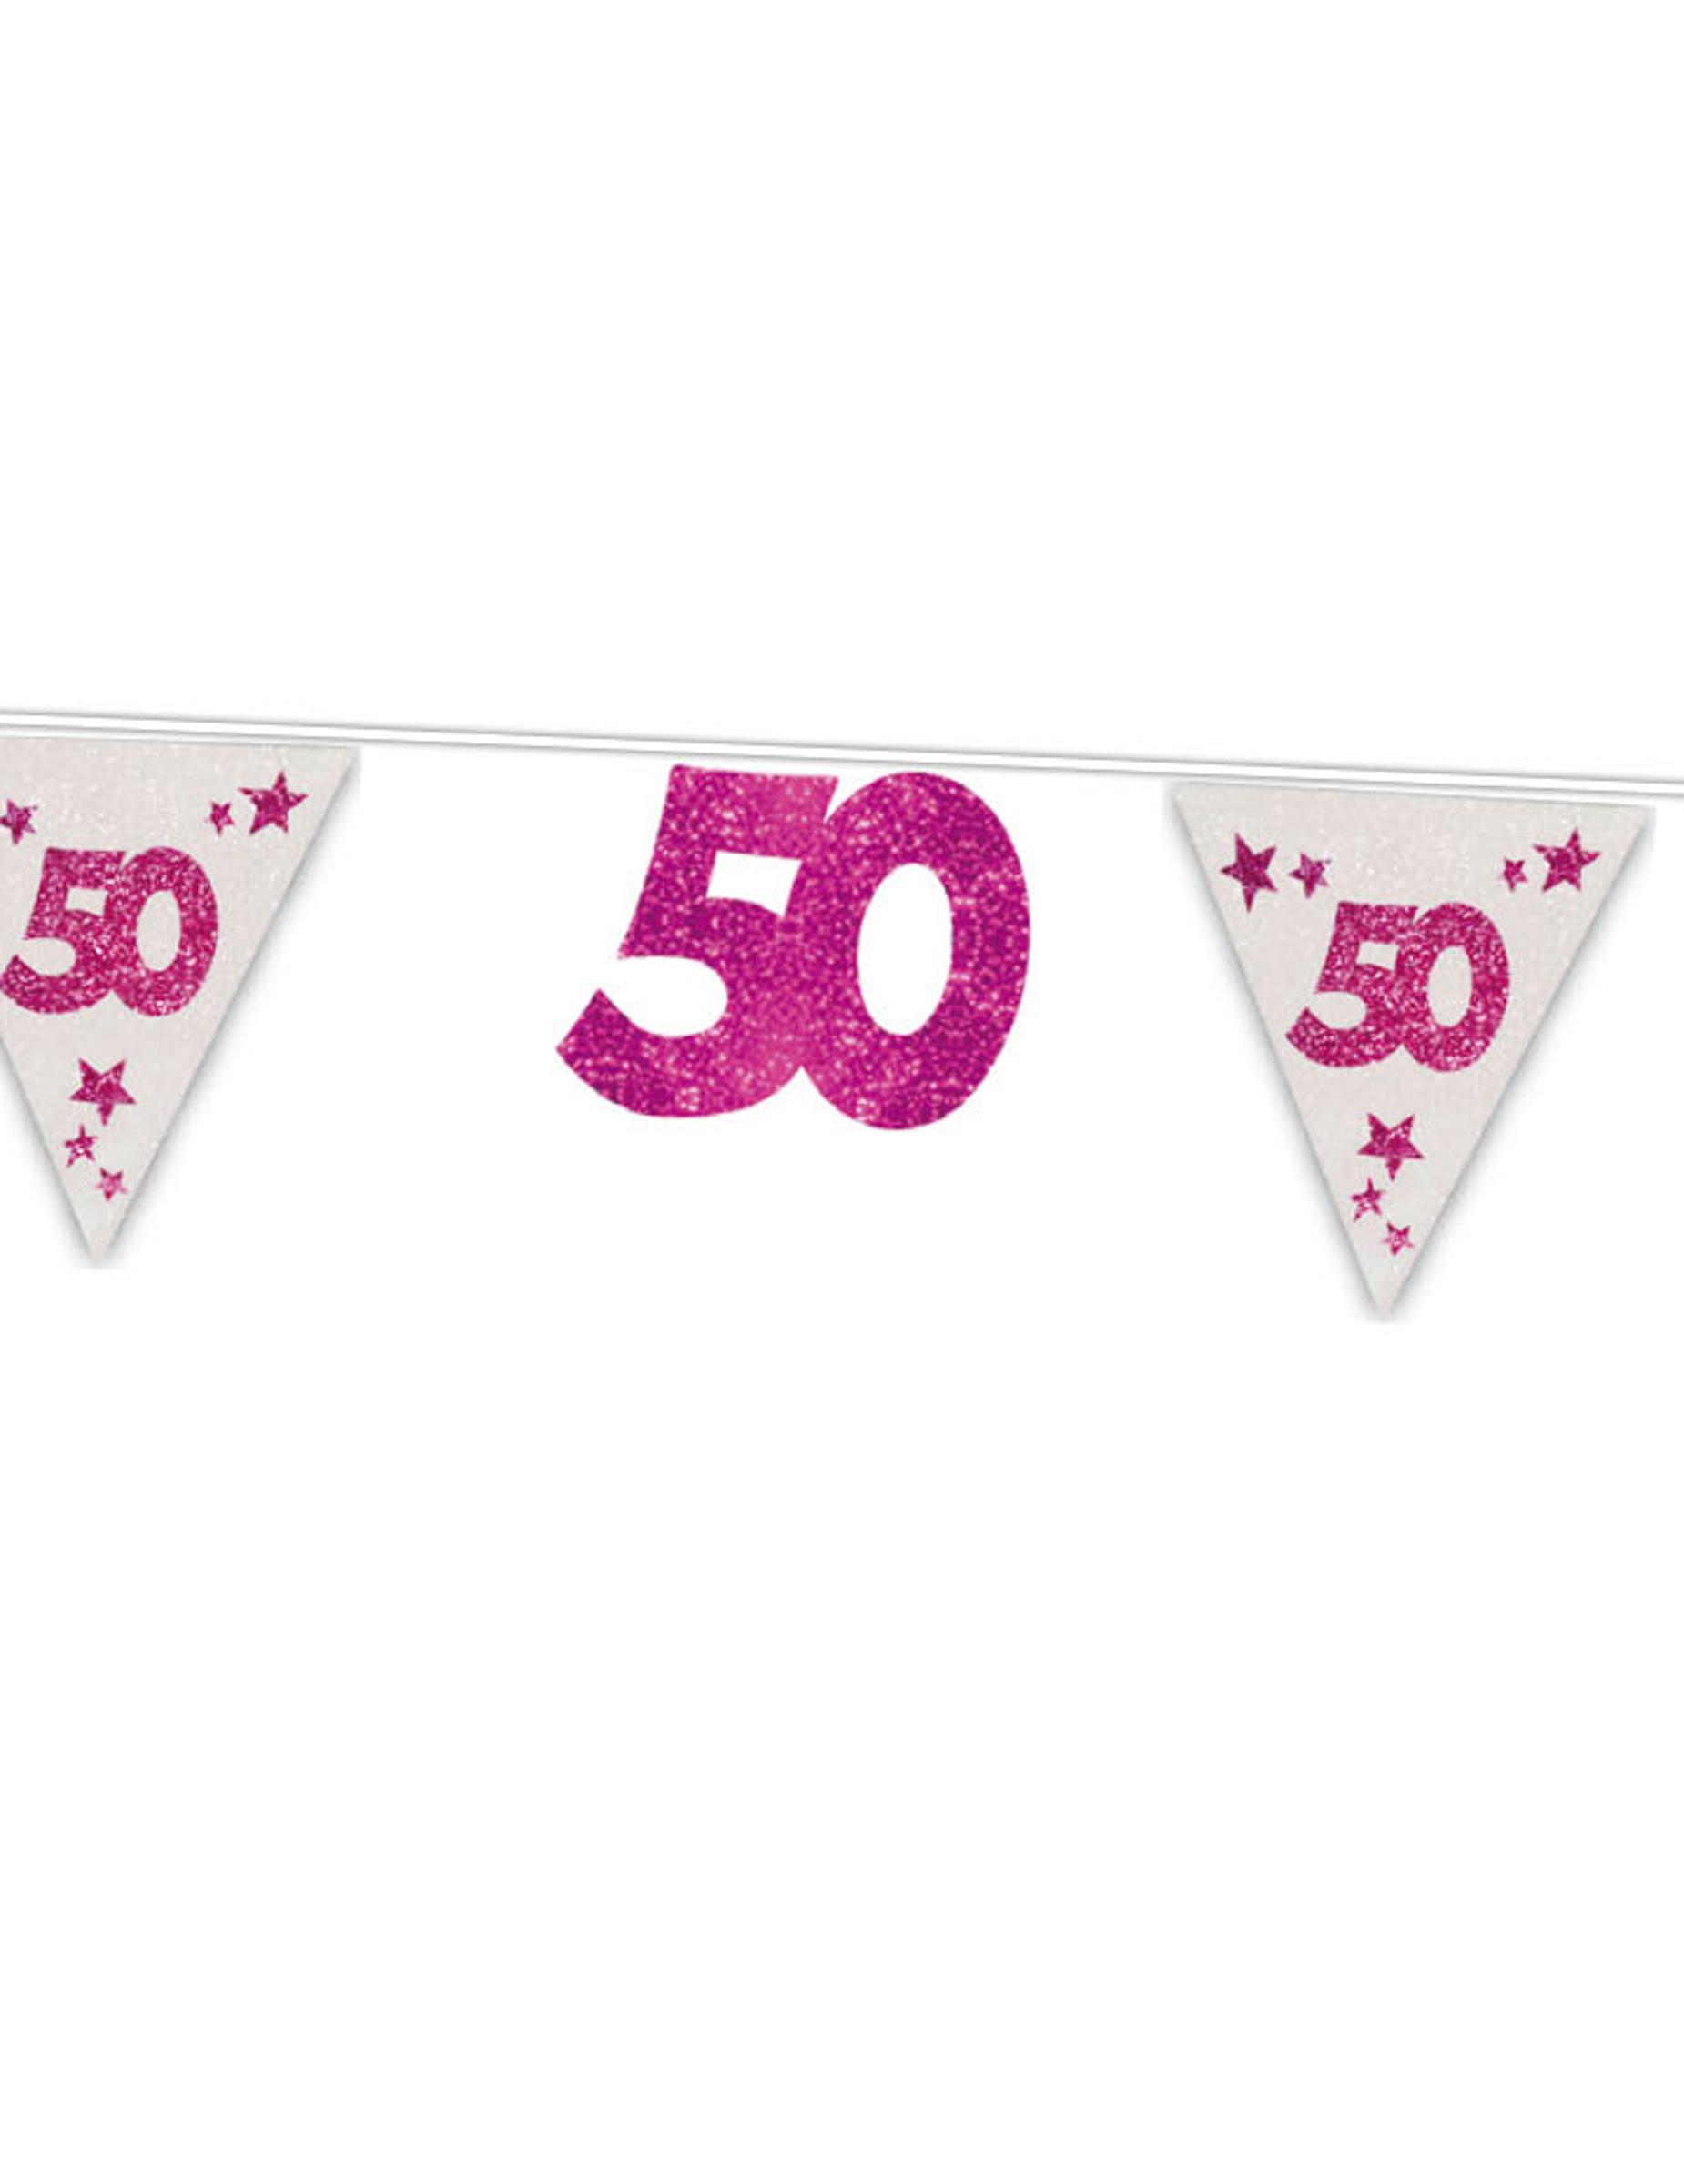 50 geburtstag girlande party deko pink 6m g nstige Deko 30 geburtstag pink